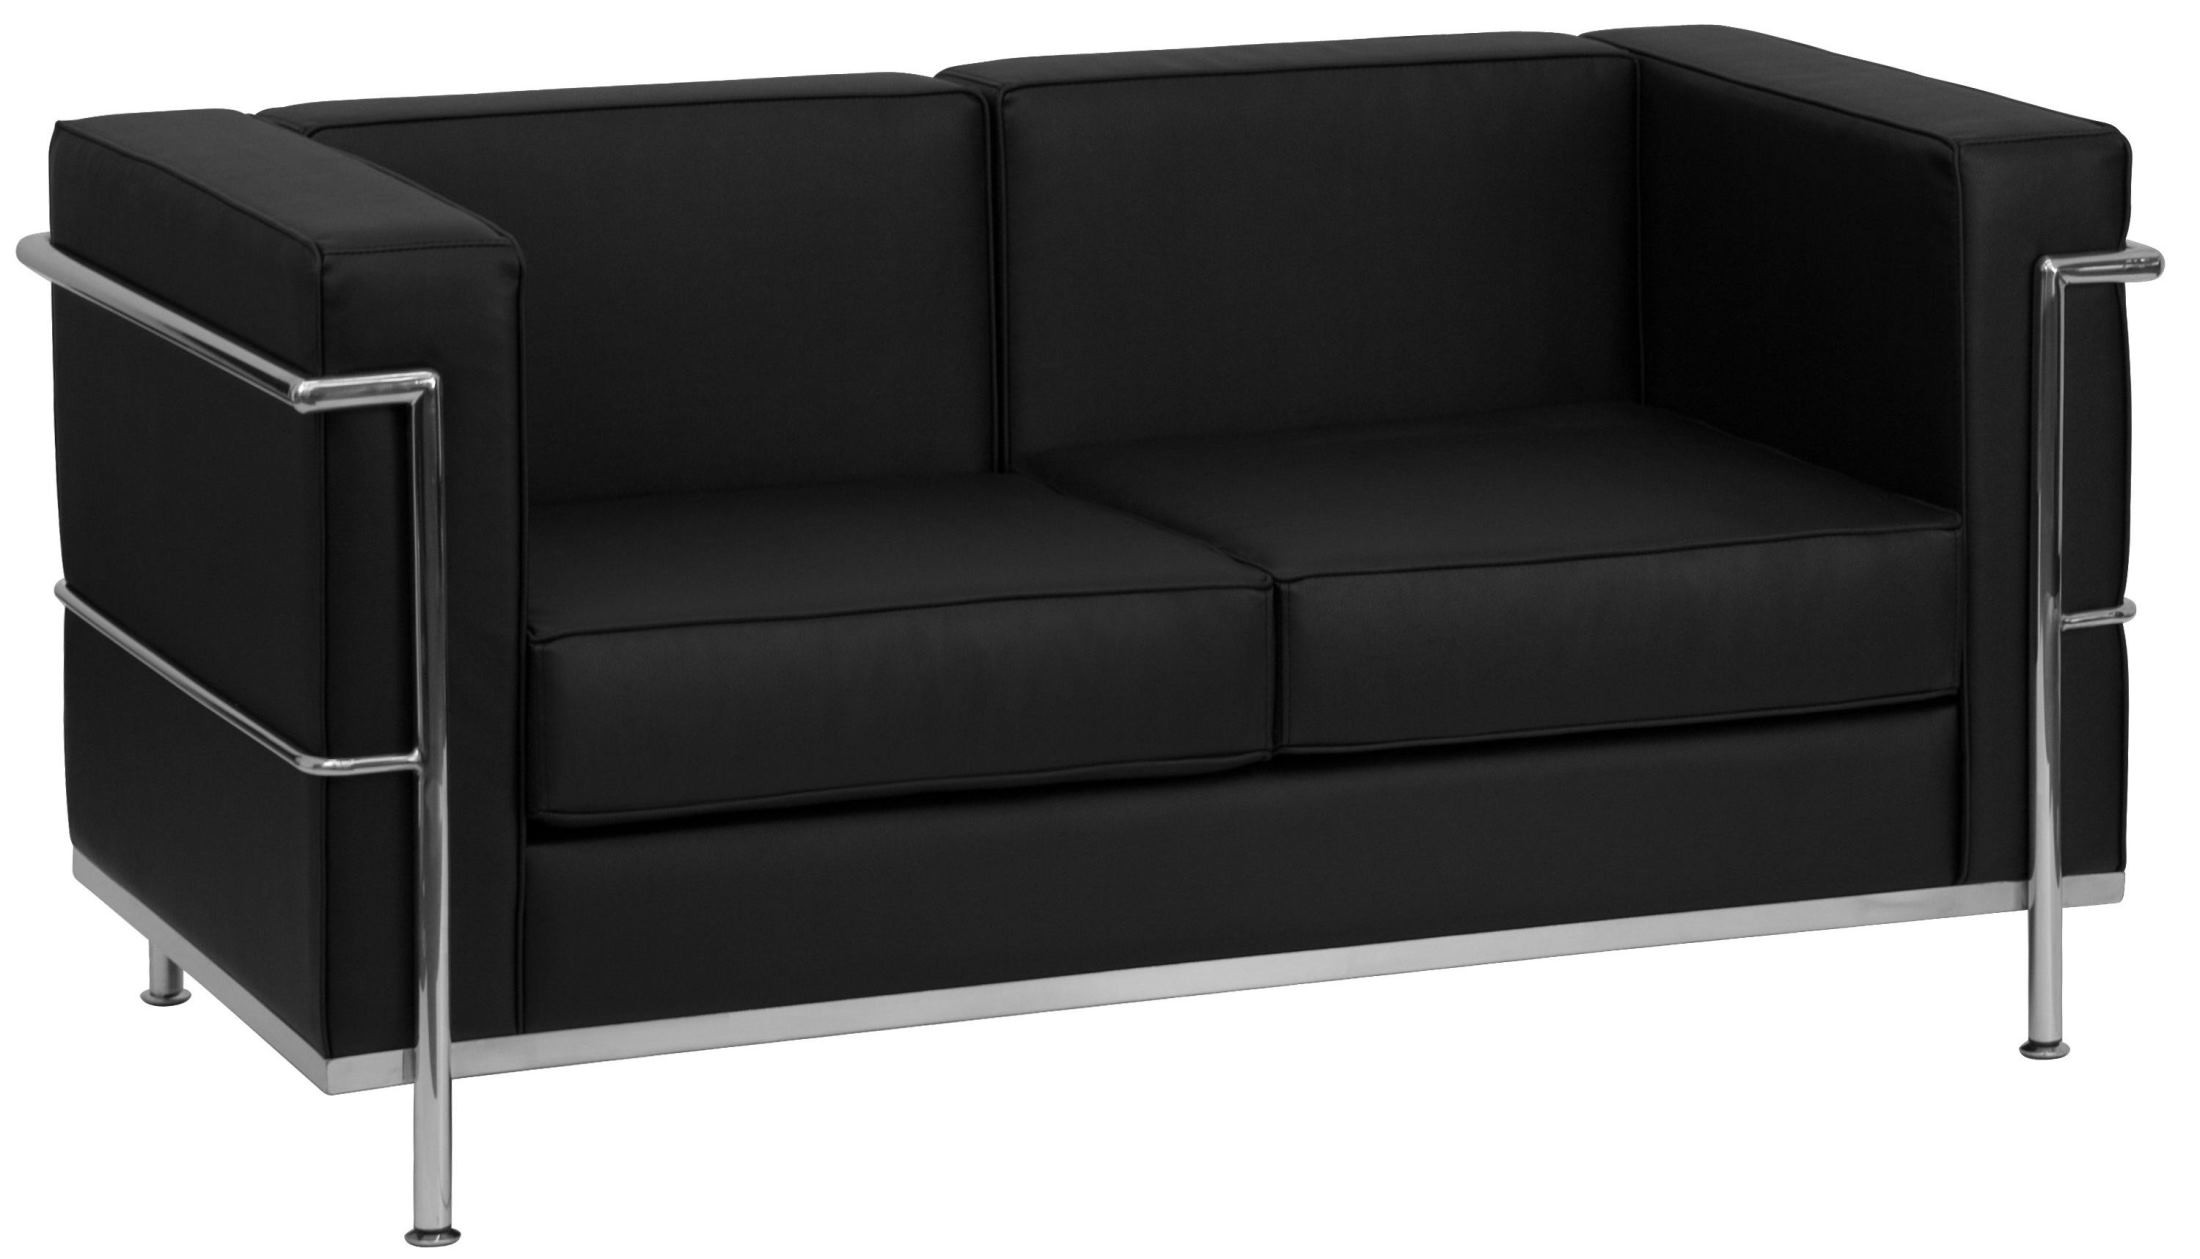 Hercules Regal Series Black Leather Loveseat From Renegade Coleman Furniture